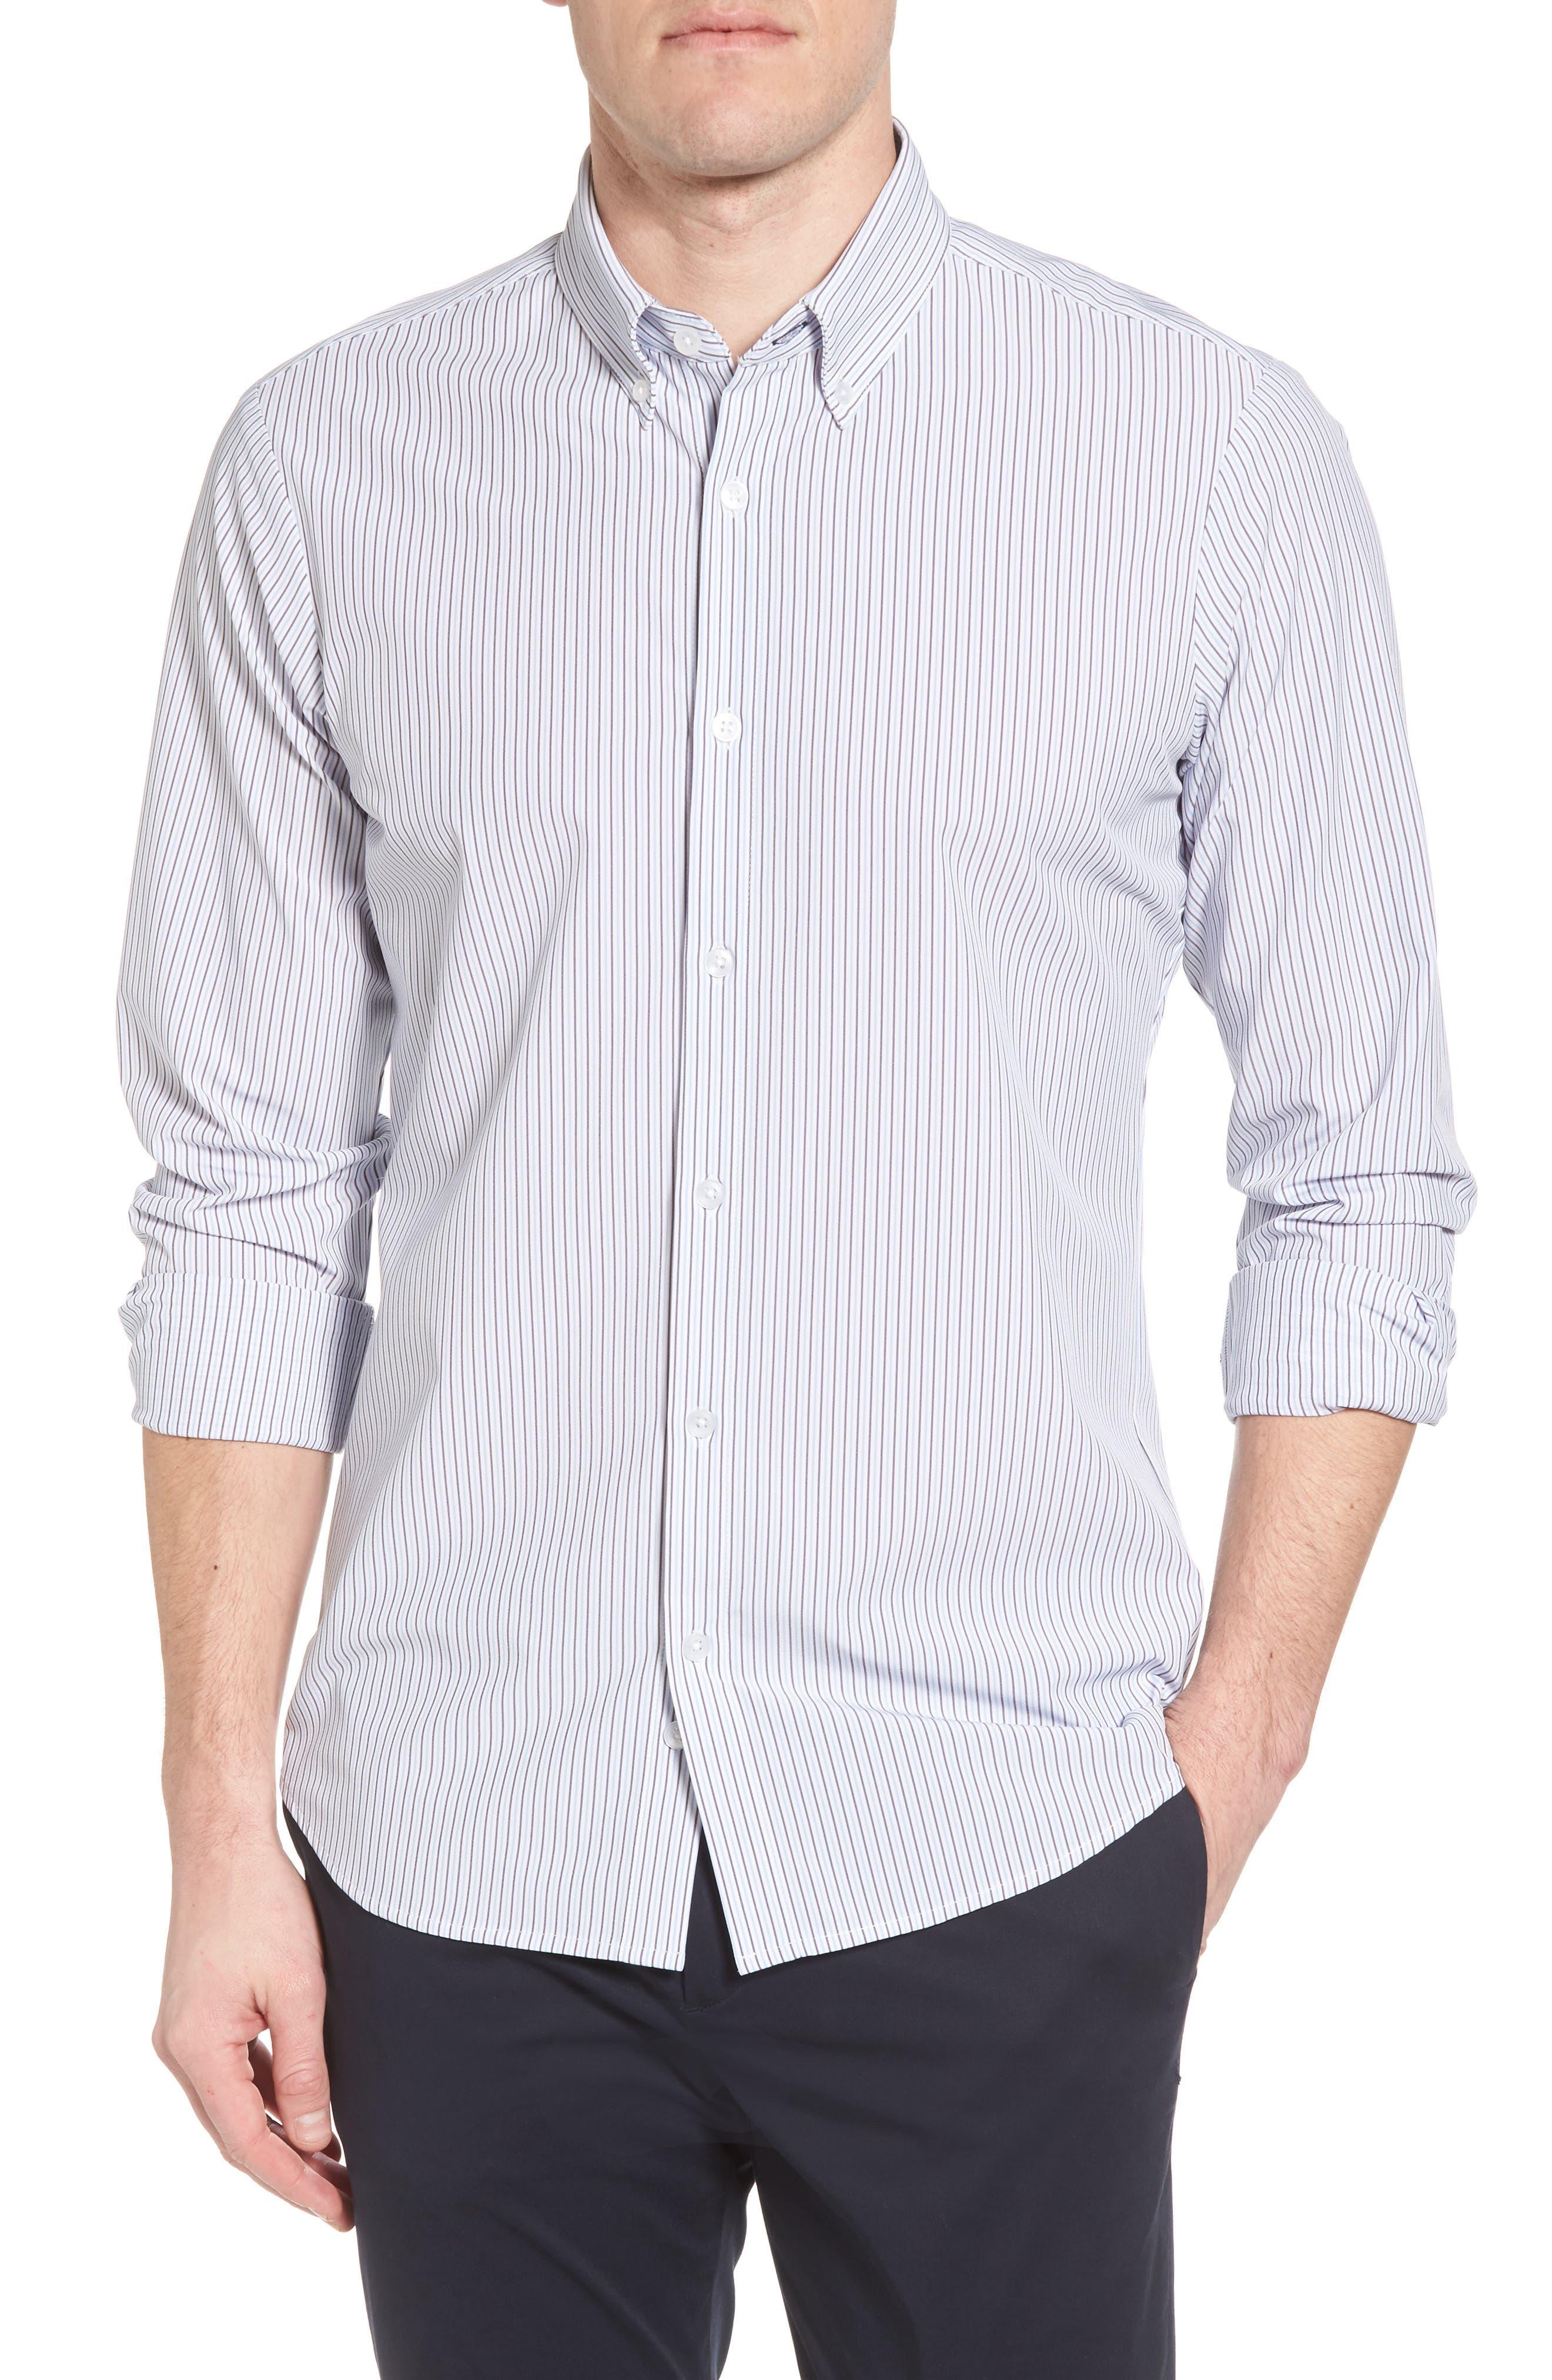 Callahan Stripe Sport Shirt,                             Main thumbnail 1, color,                             477